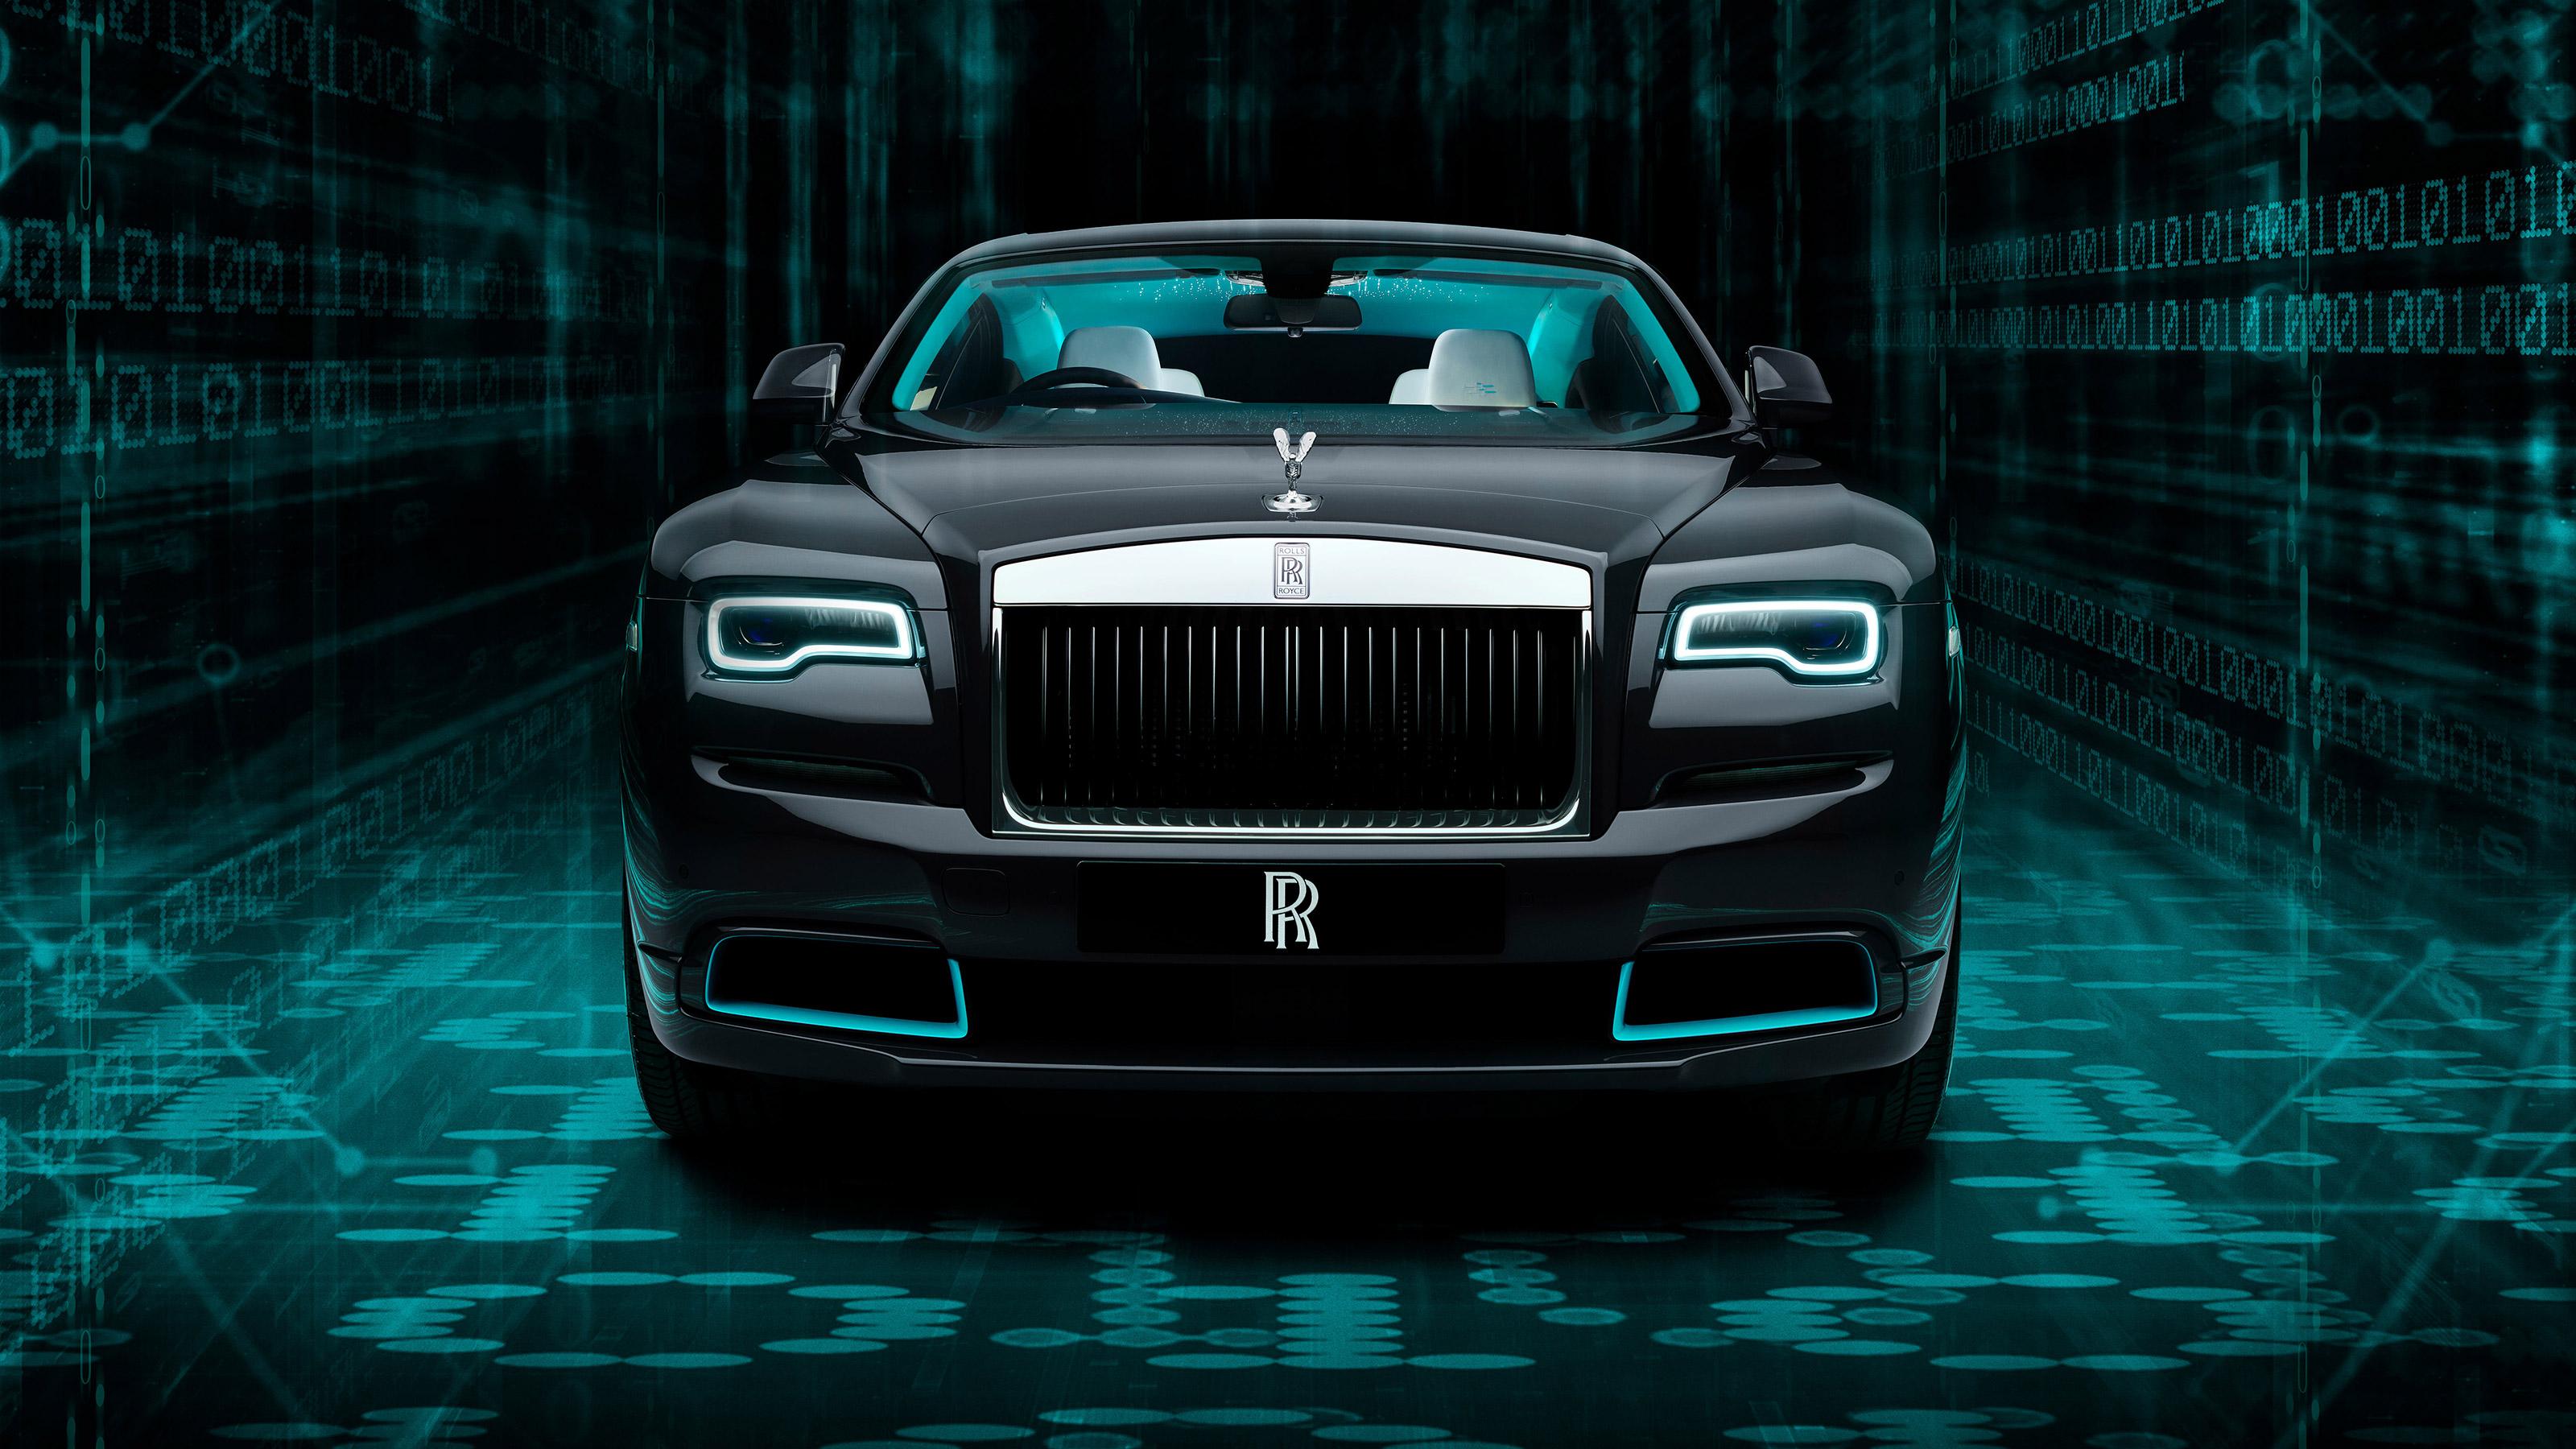 The Rolls Royce Wraith Kryptos Is Full Of Secrets Evo